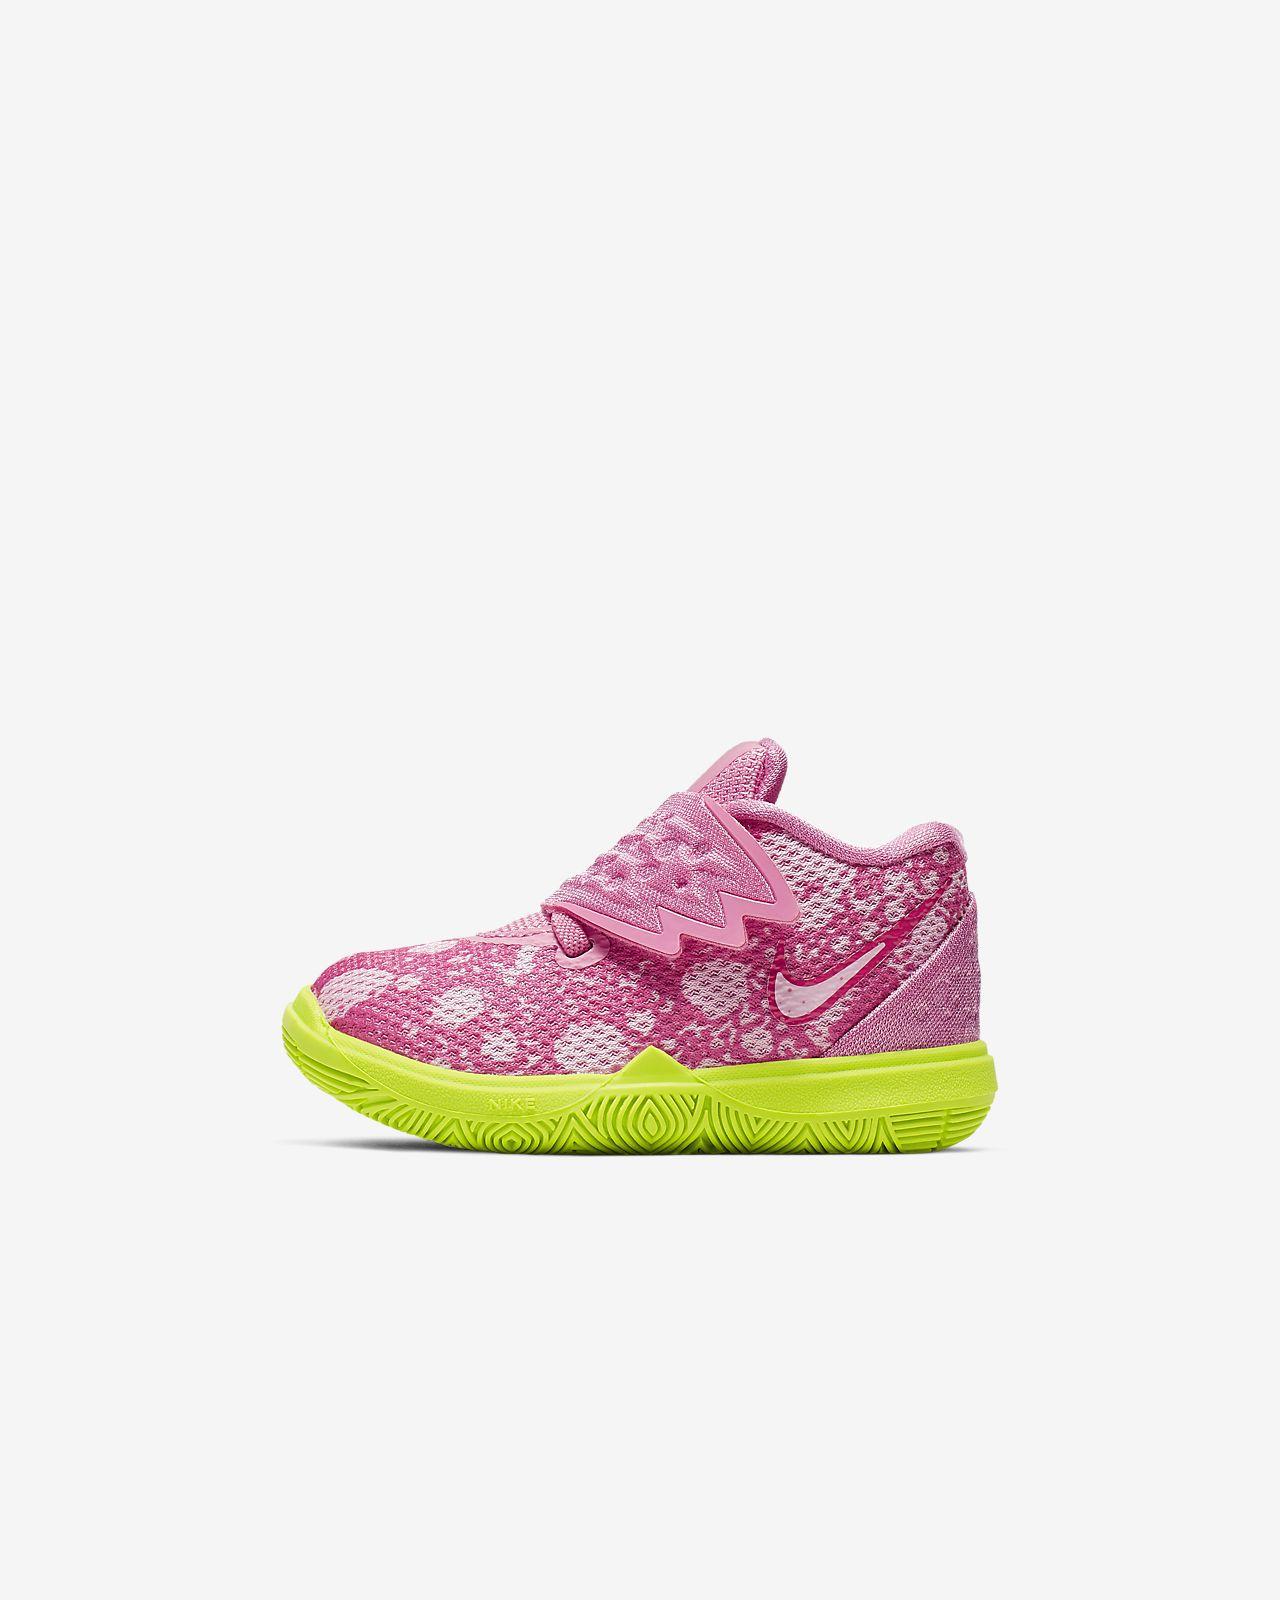 Kyrie 5 SB BT 婴童运动童鞋